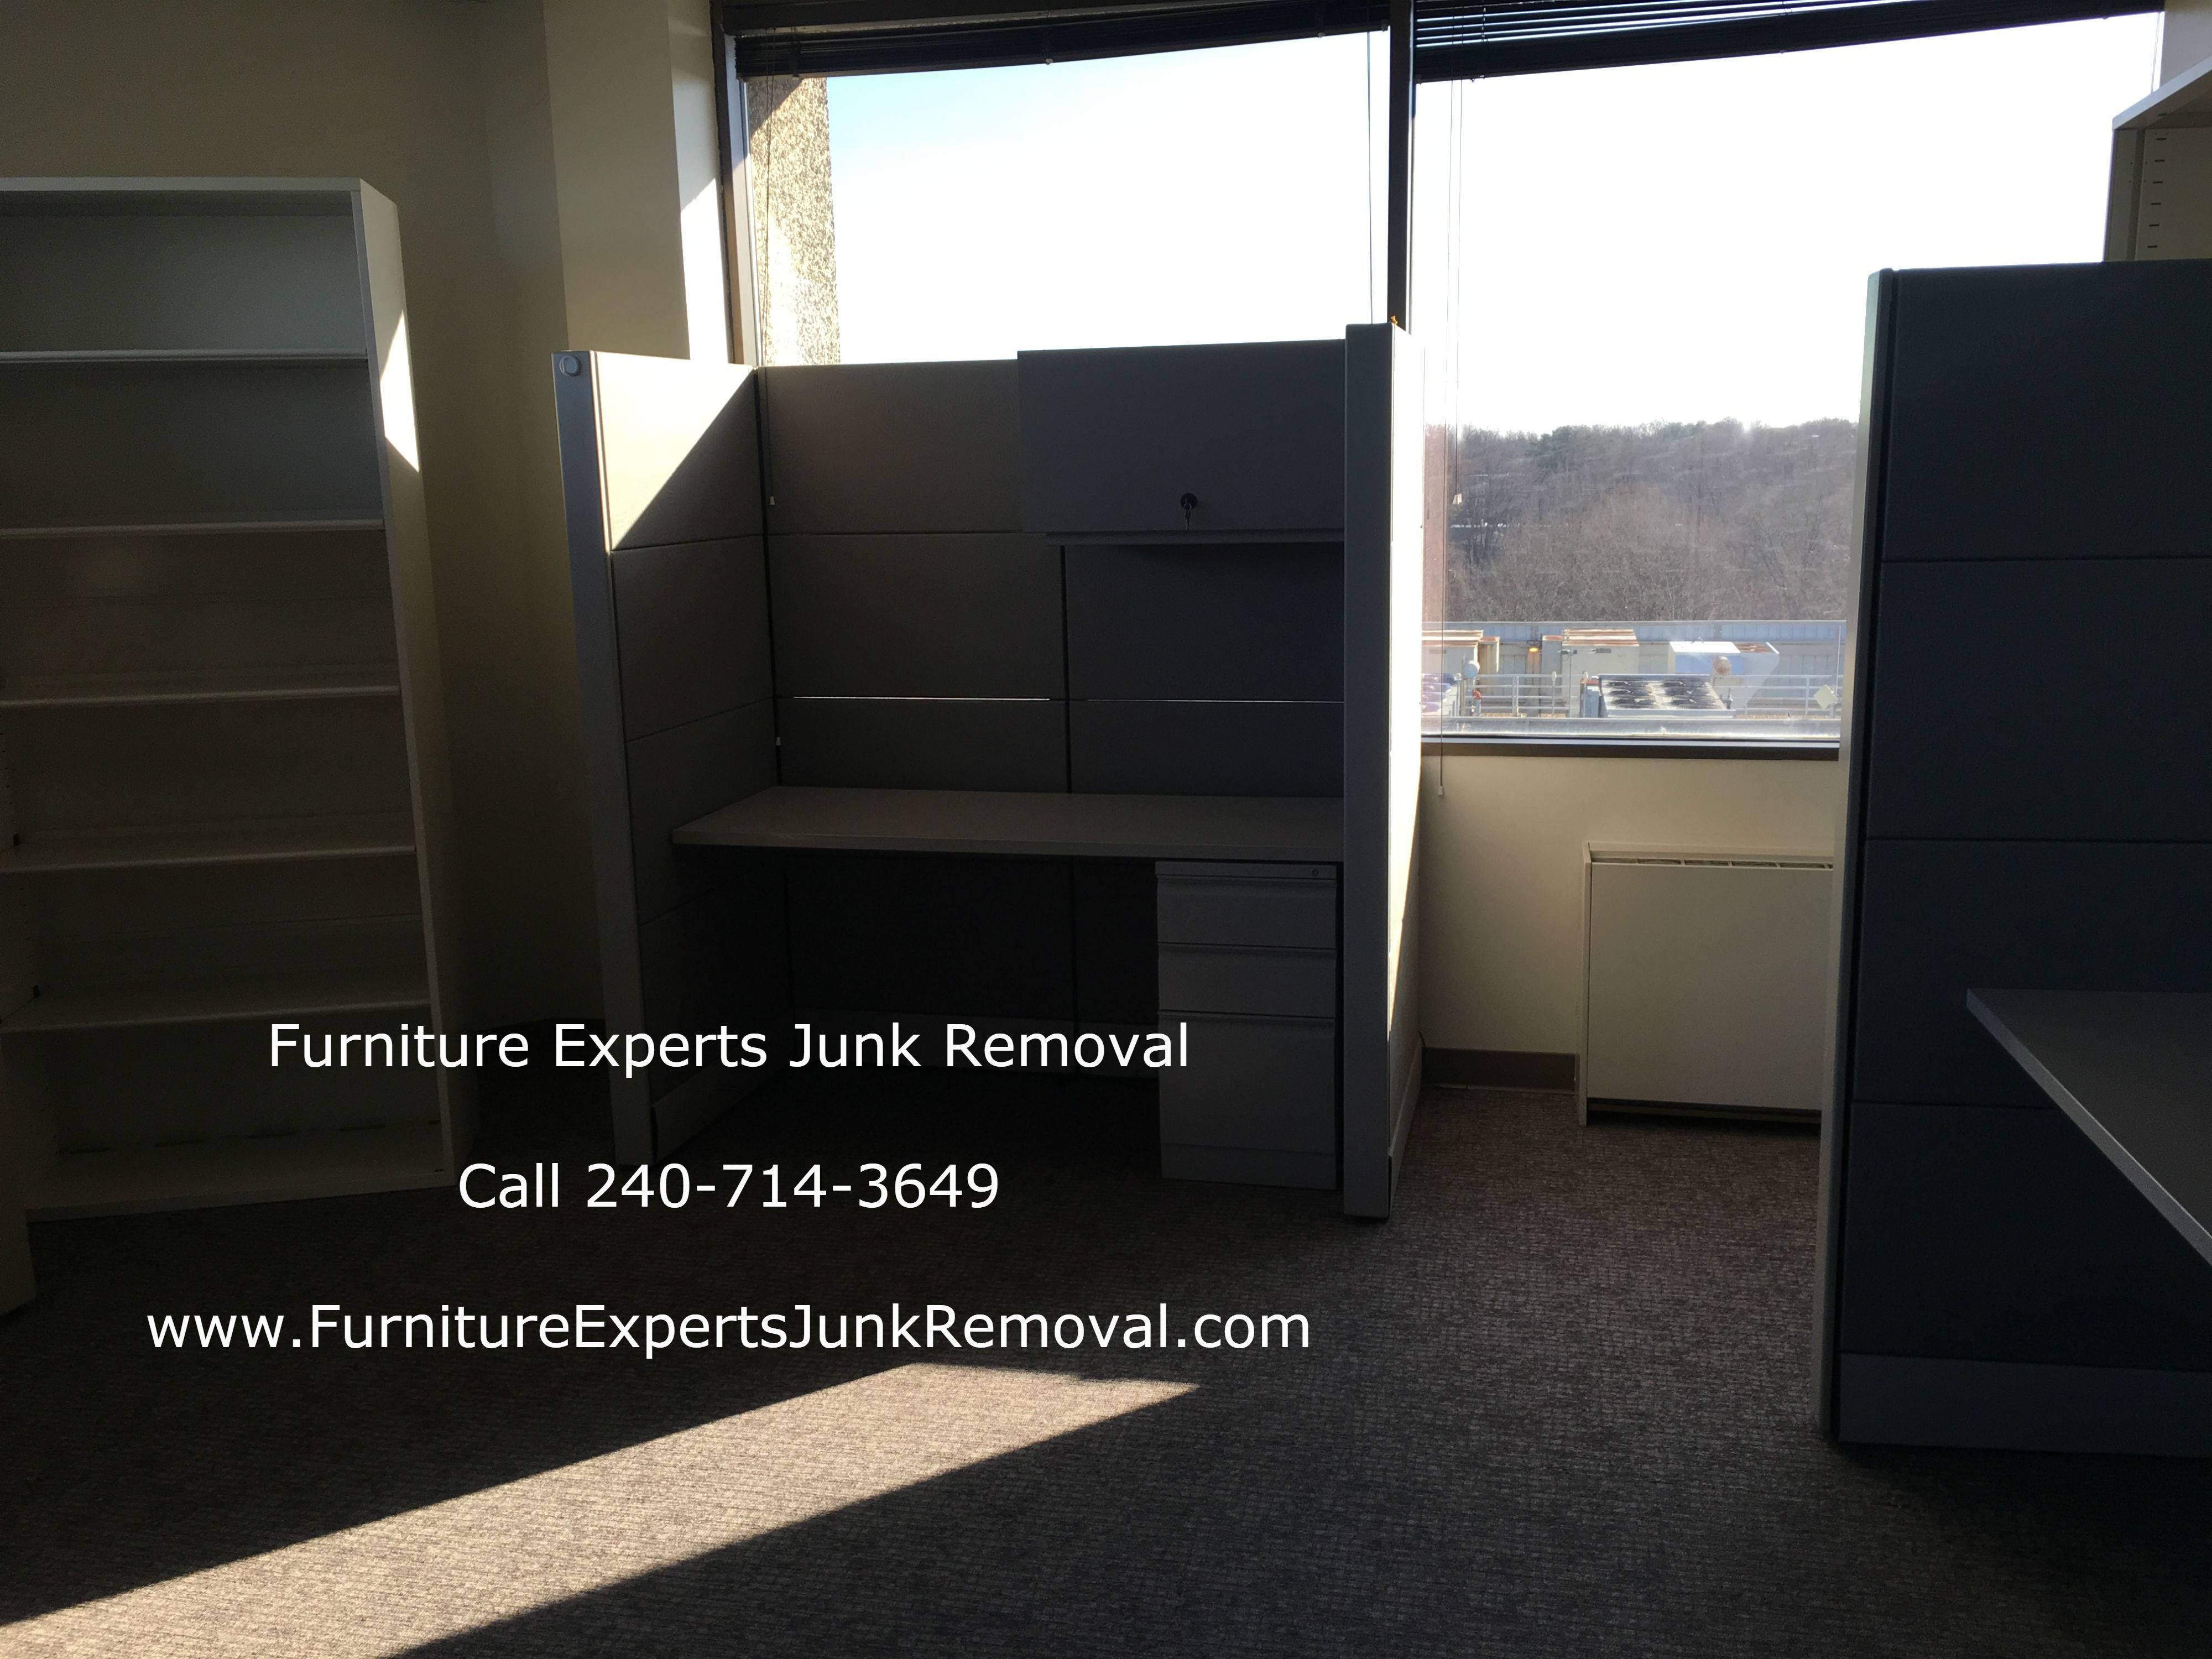 Junk office furniture removal in Springfield VA